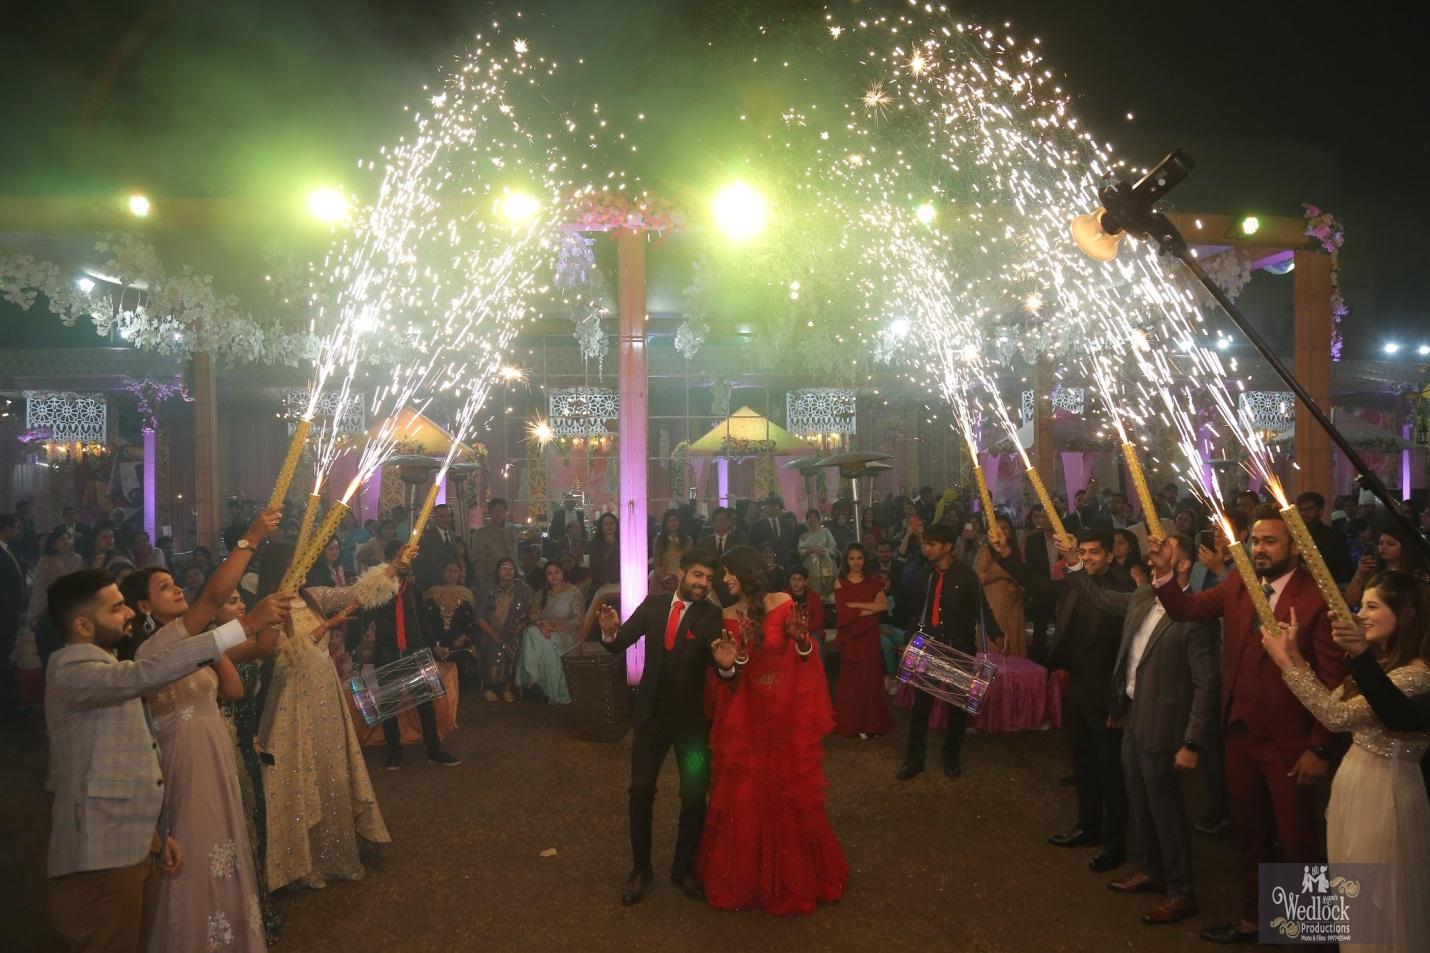 Bride and groom dance performance